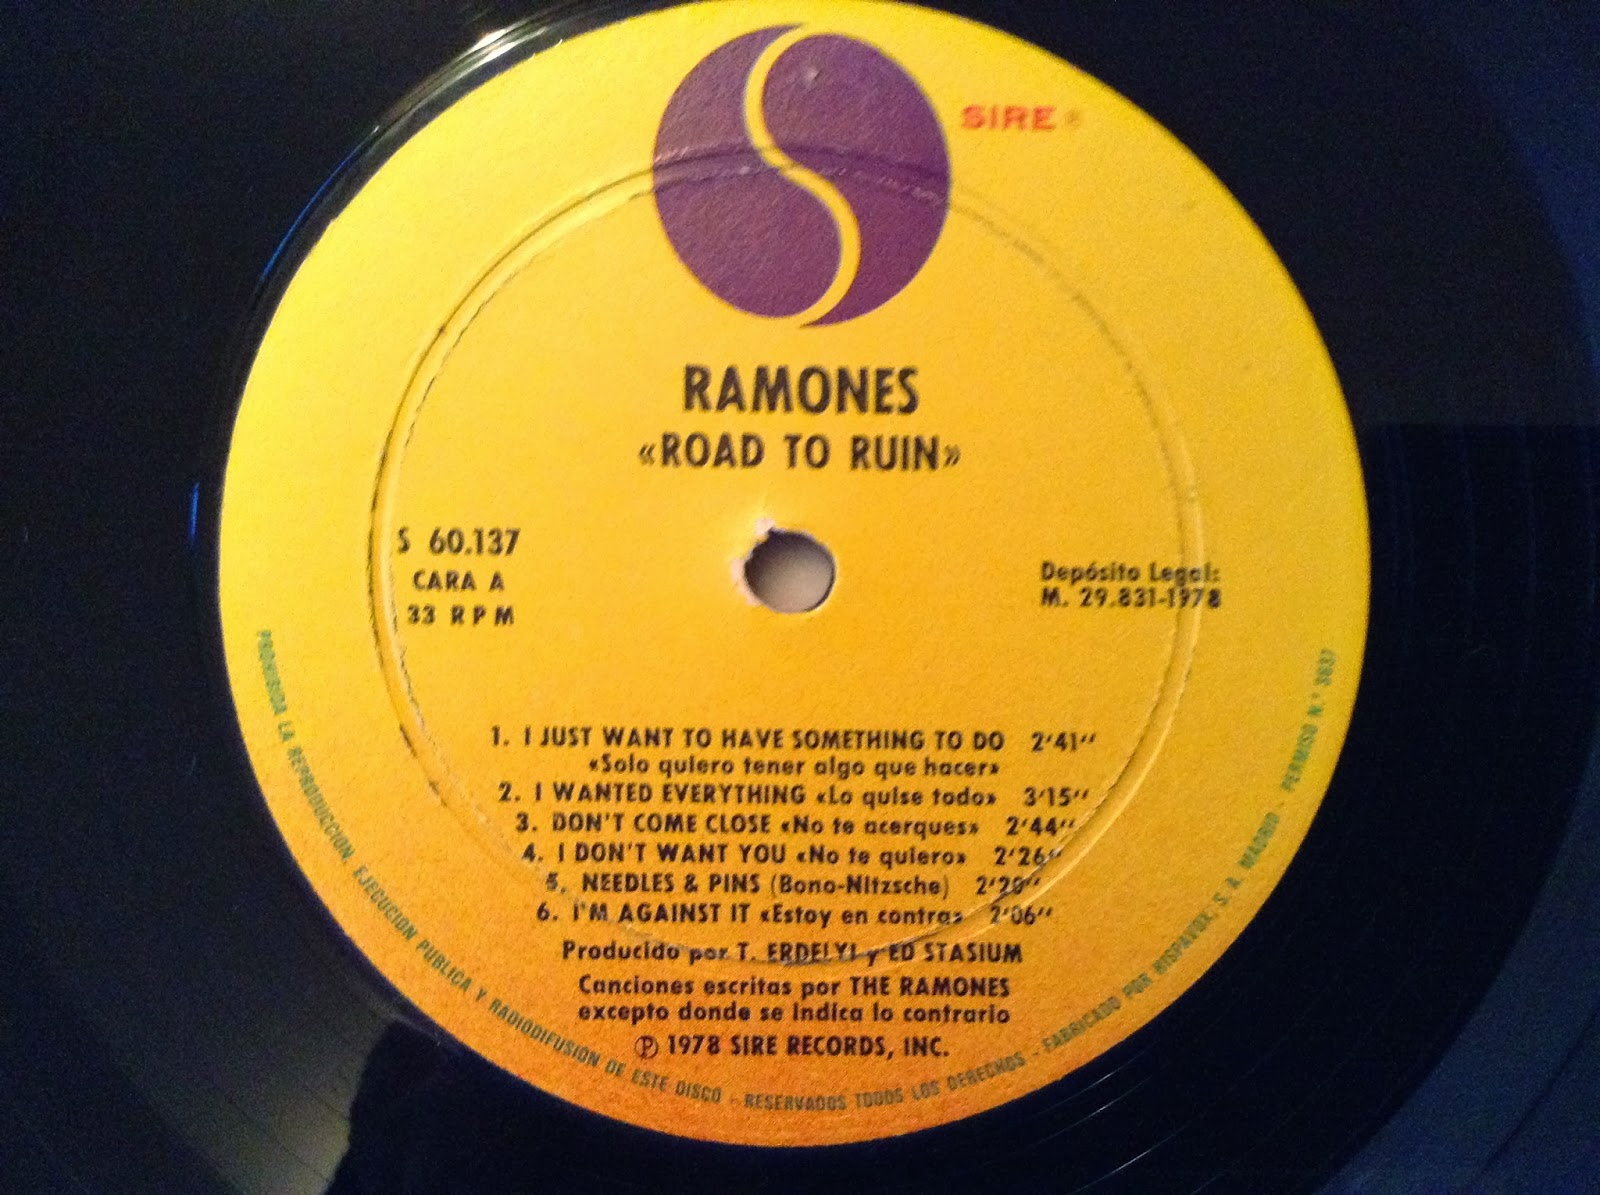 Ramones On Vinyl